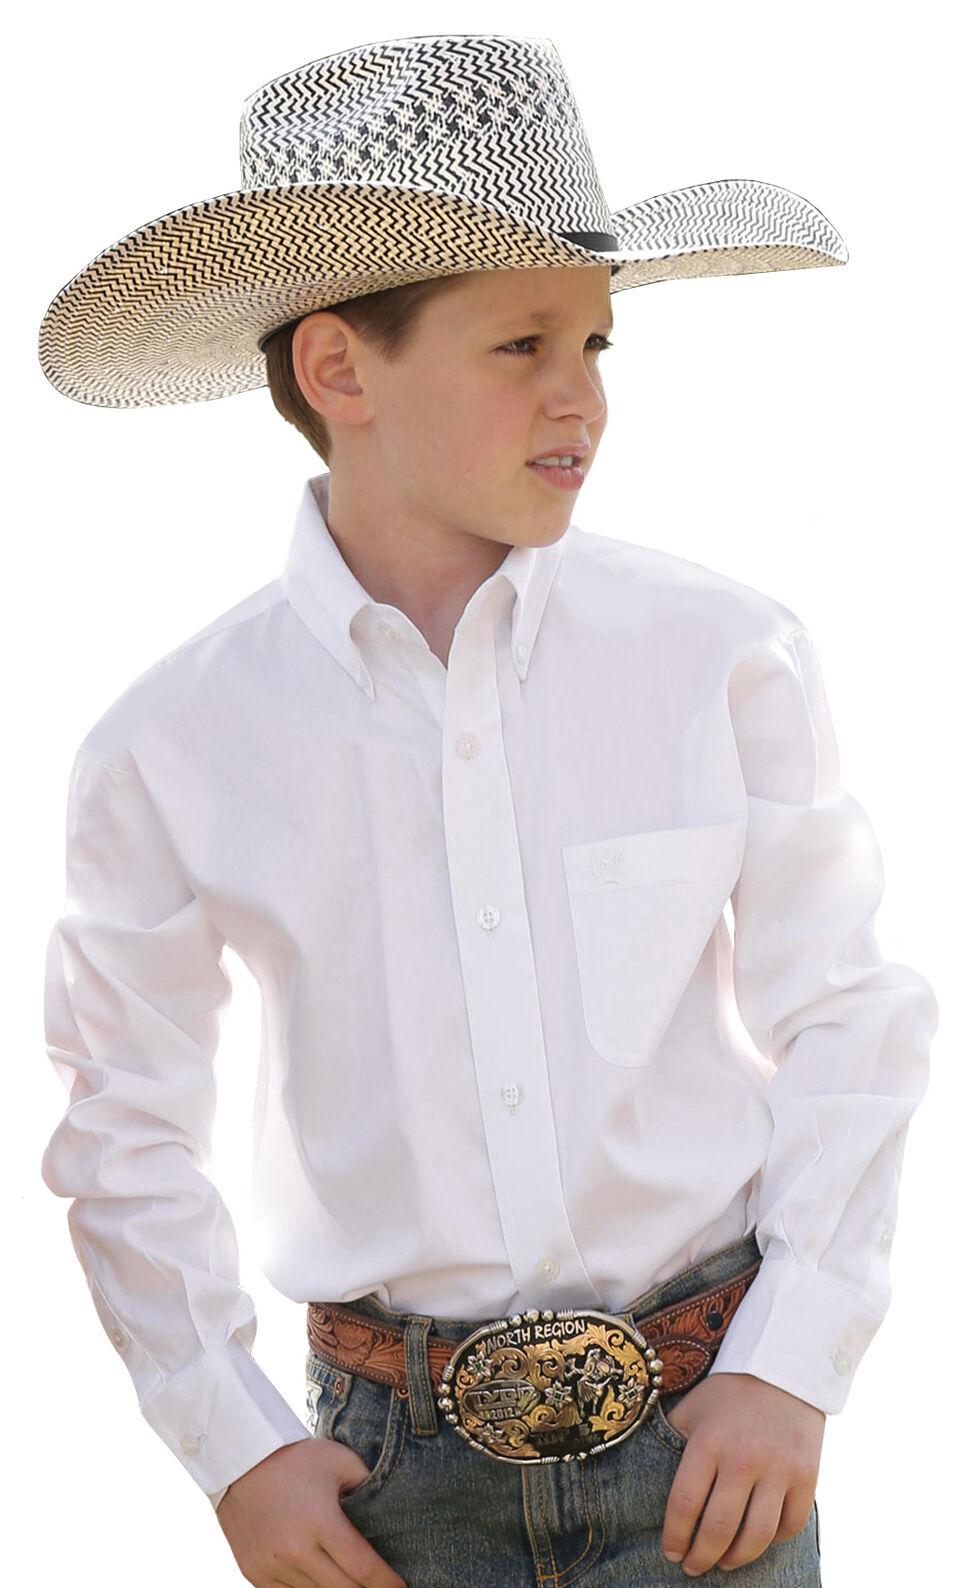 Cinch ® Boys' Long Sleeve Shirt, White, hi-res